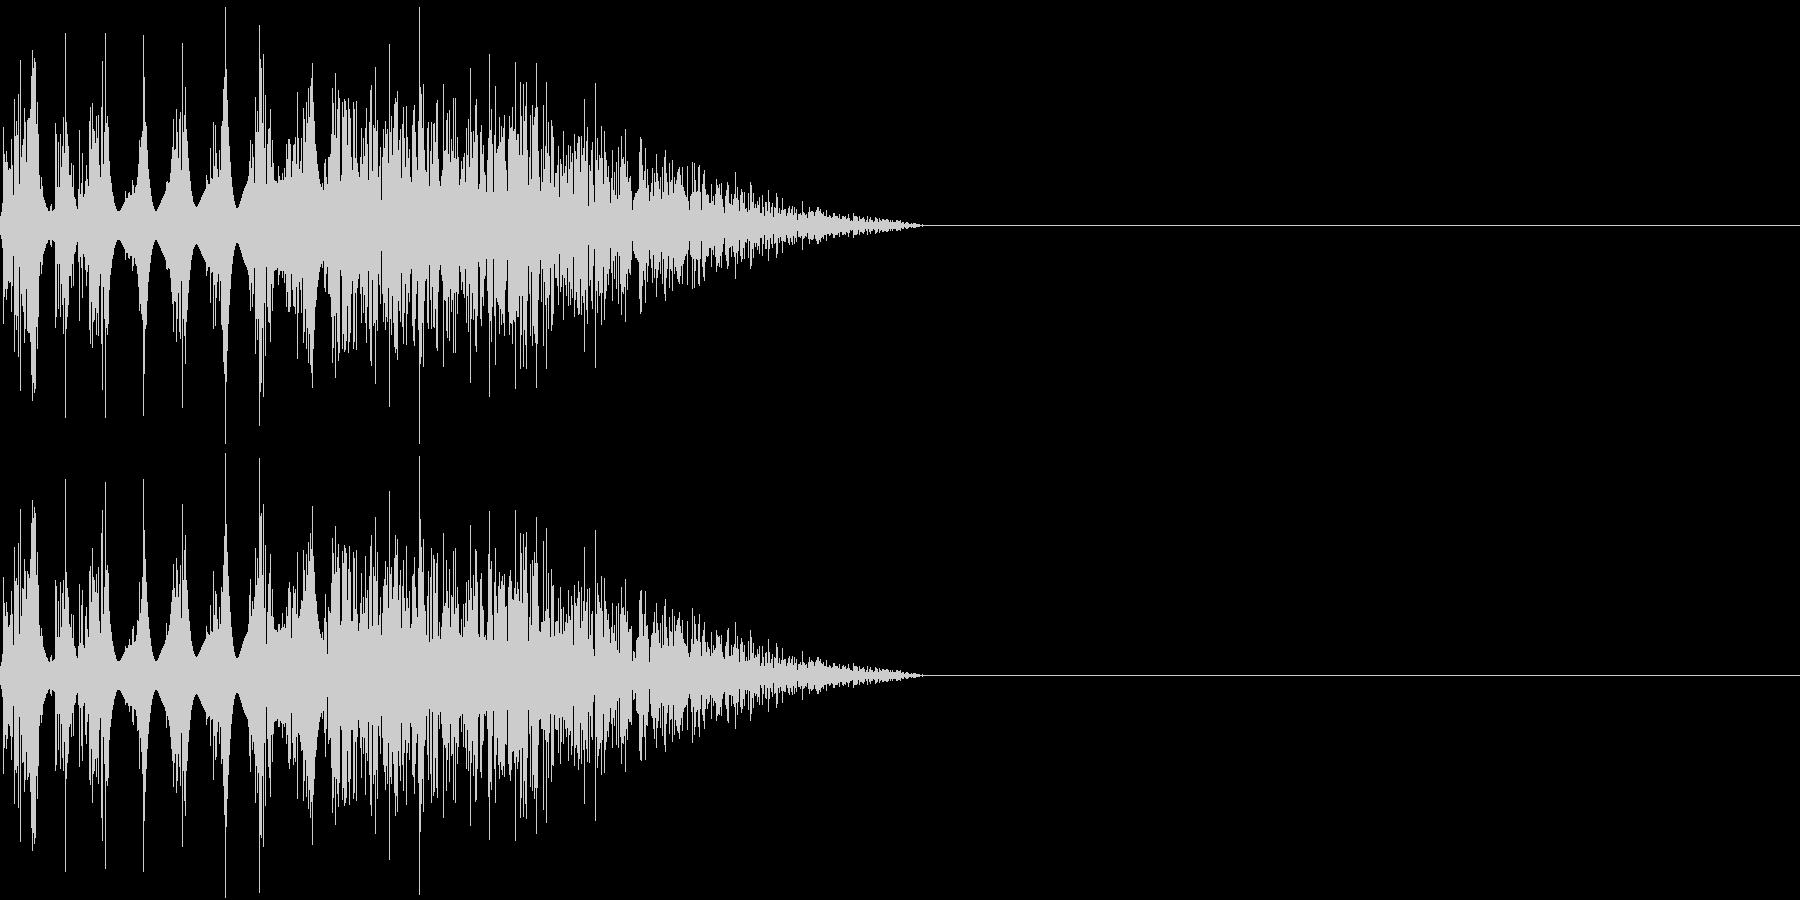 DTM Snare 2 オリジナル音源の未再生の波形